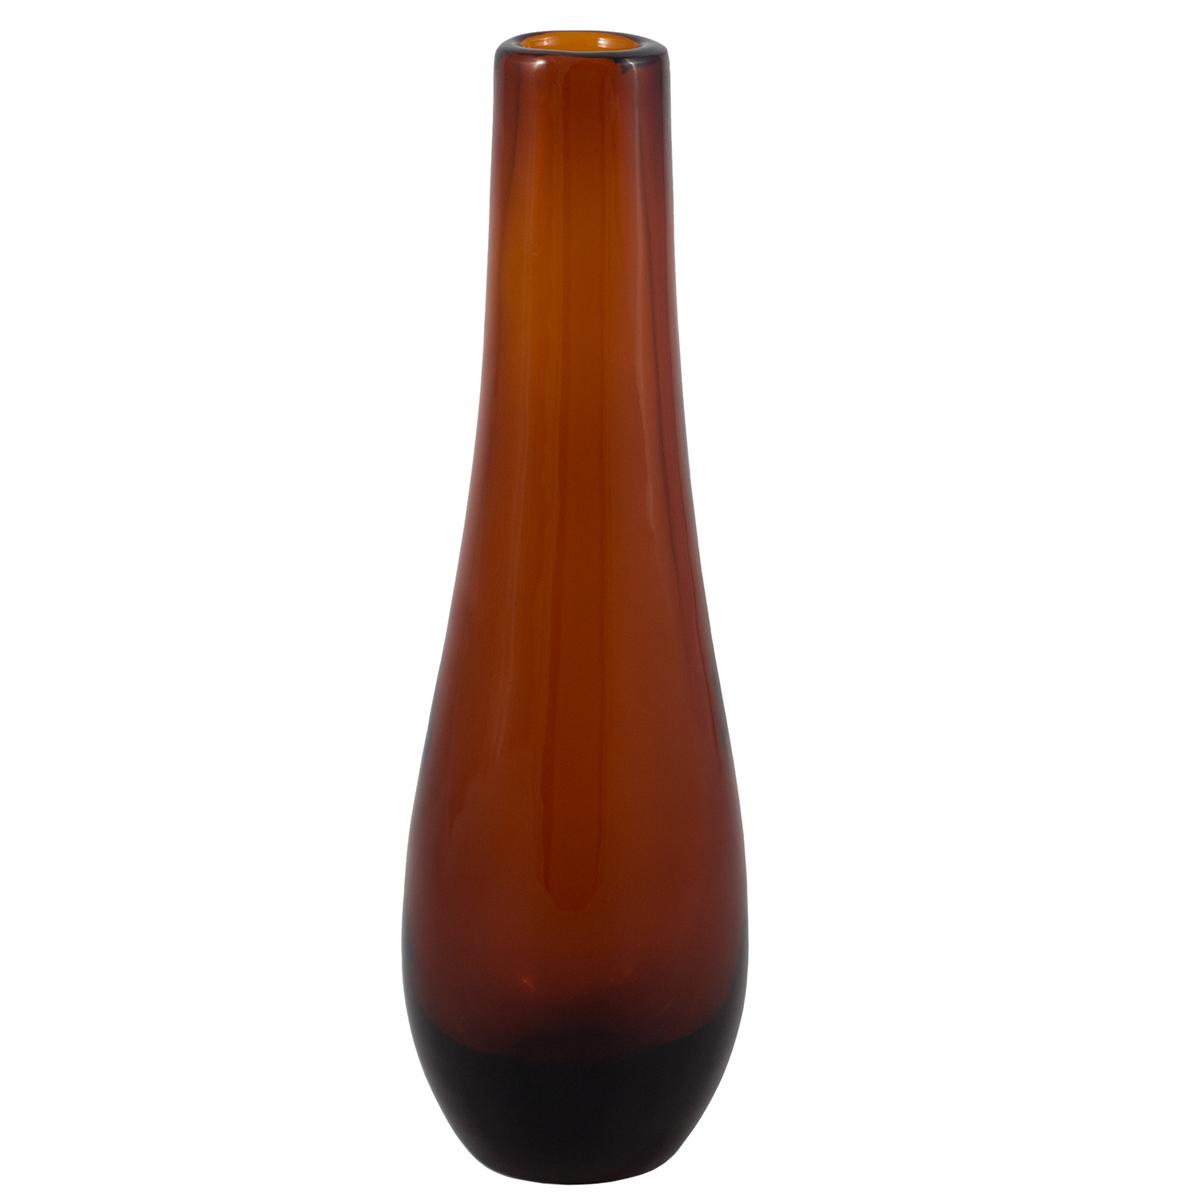 Klassik studio knox 33 vase amber finnish design shop